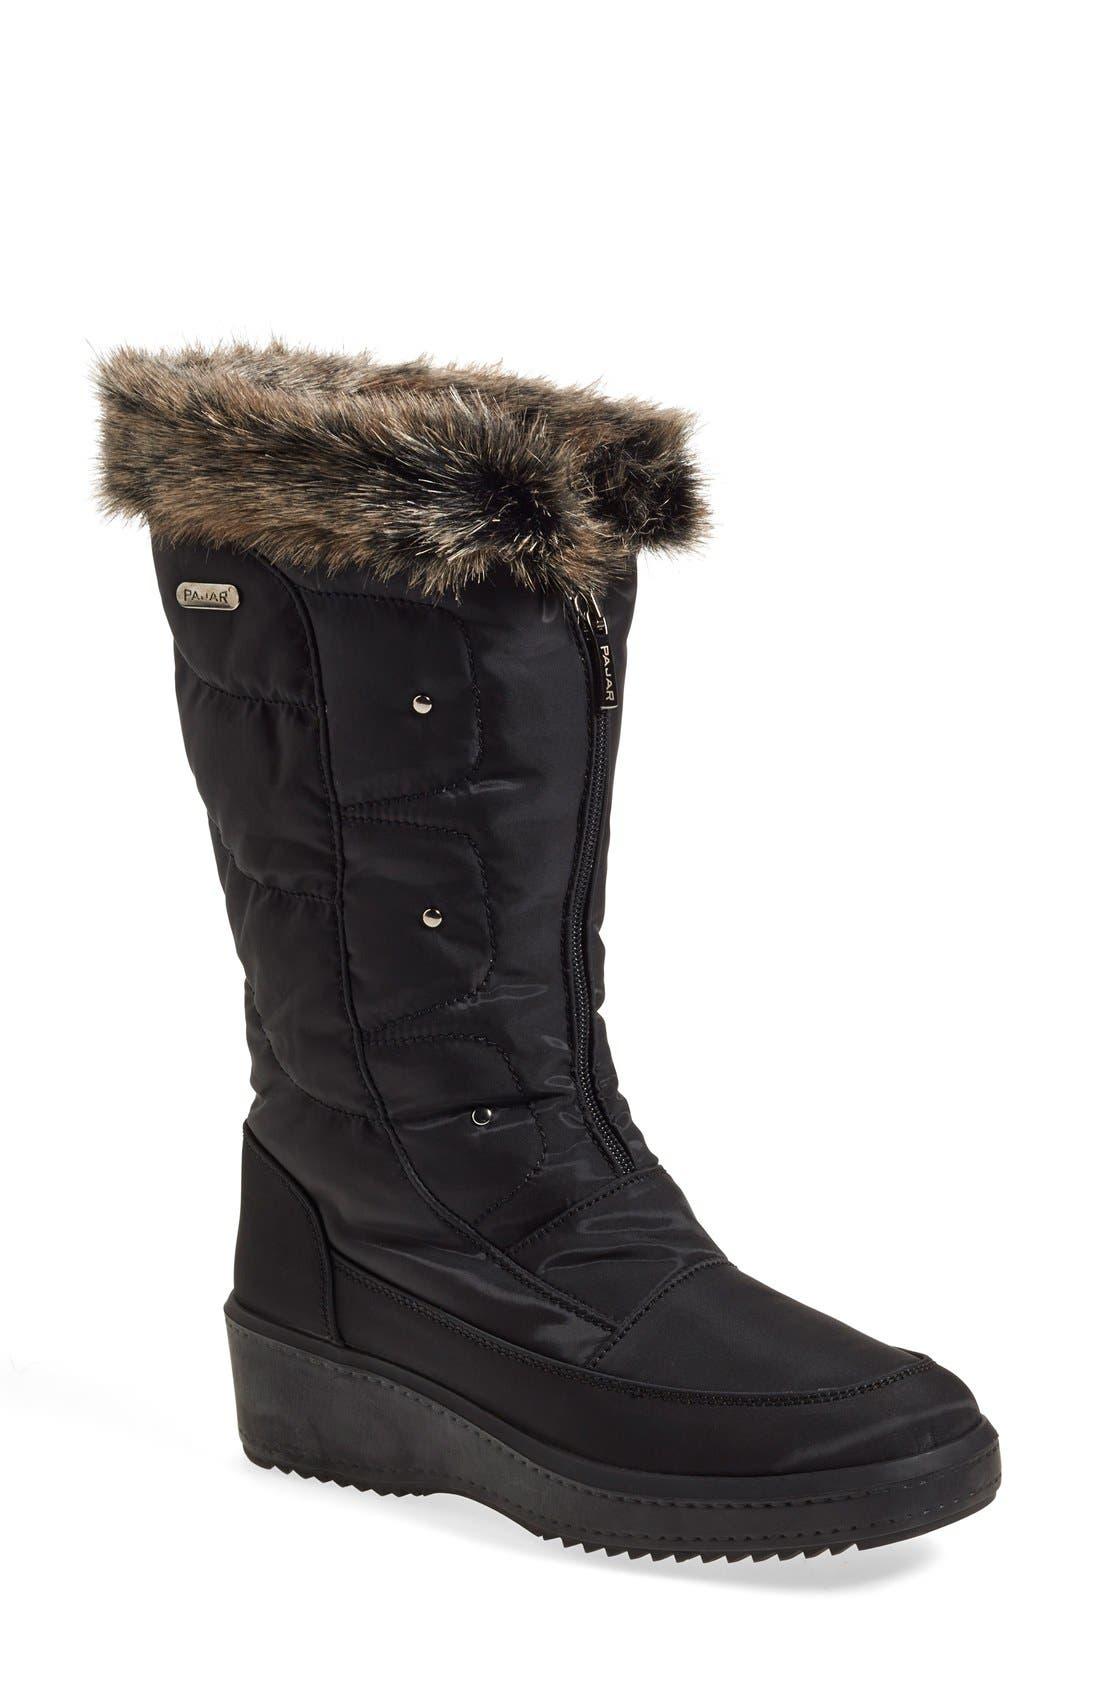 PAJAR 'Louise' Weatherproof Boot